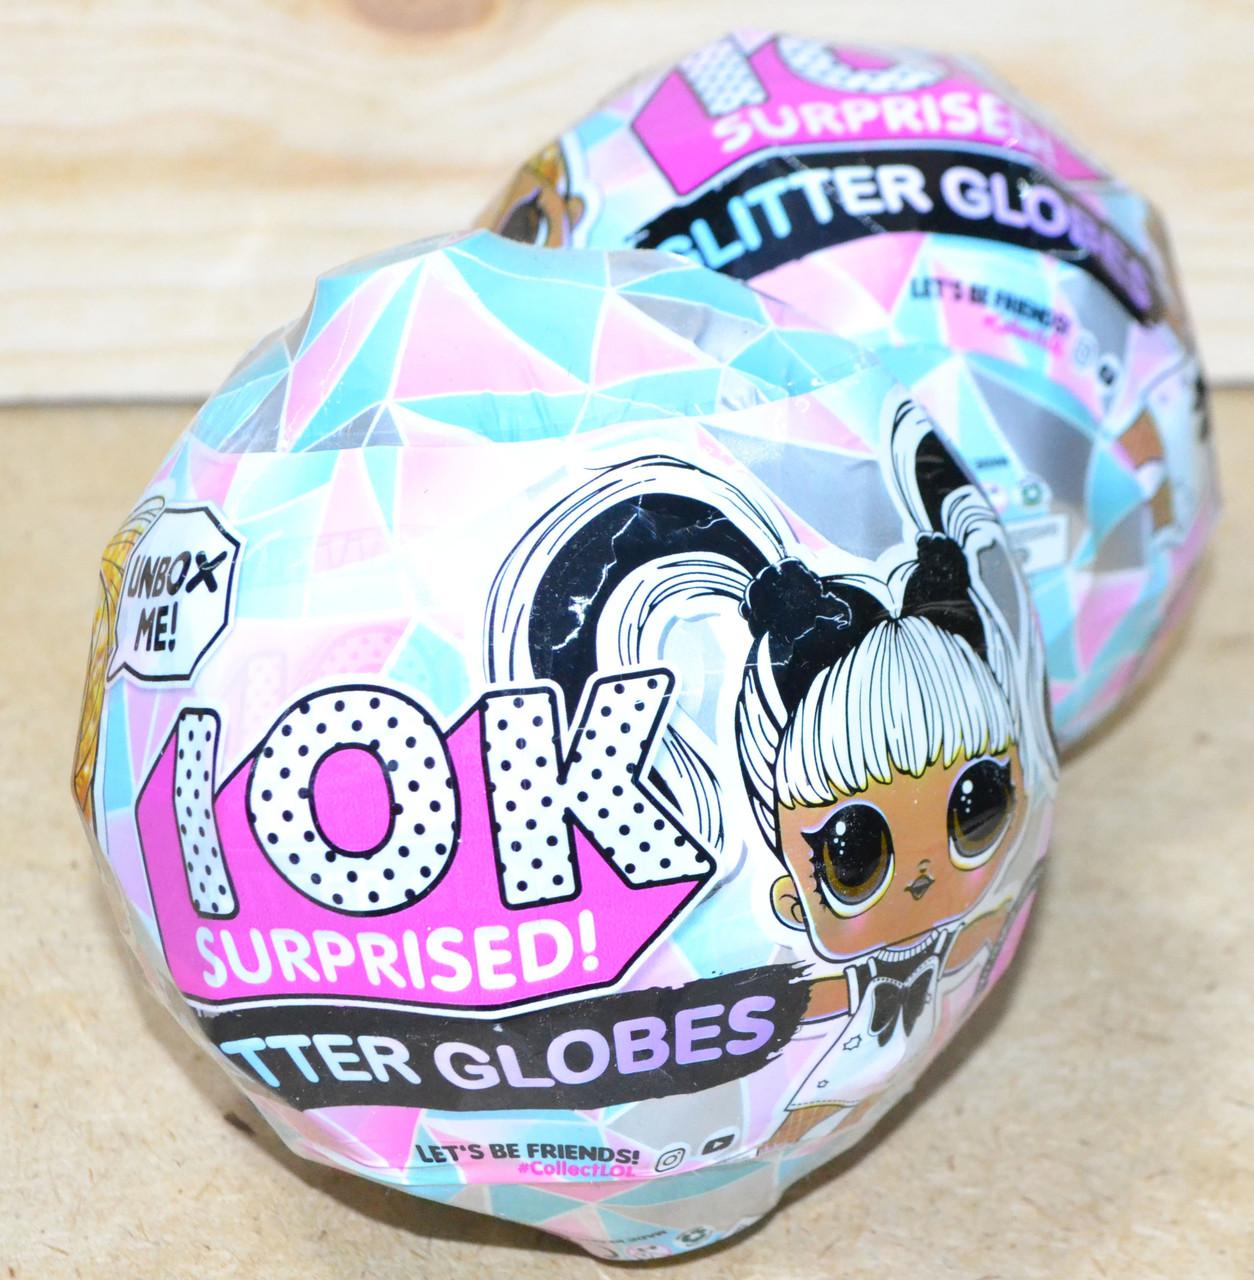 BB078 Кукла лол LOK Glitter Globes сюрприз в кристале светится, цена за 1шт 13*11